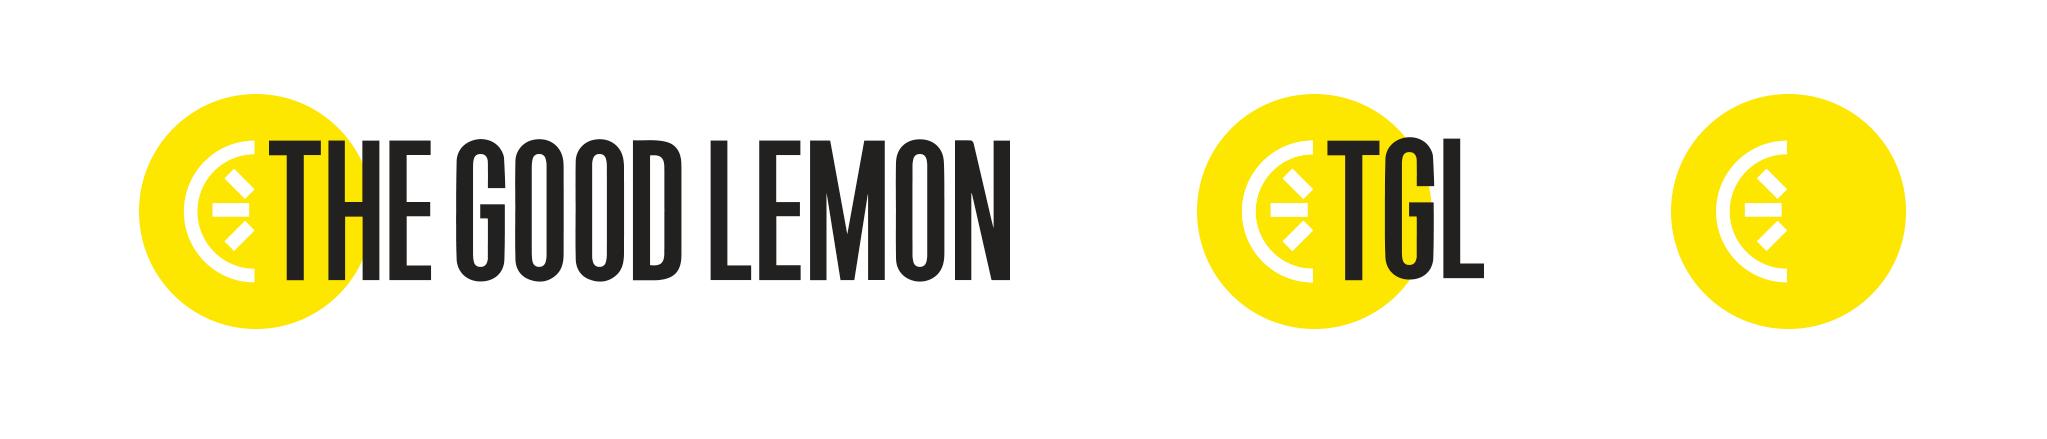 Three variations of The Good Lemon logo